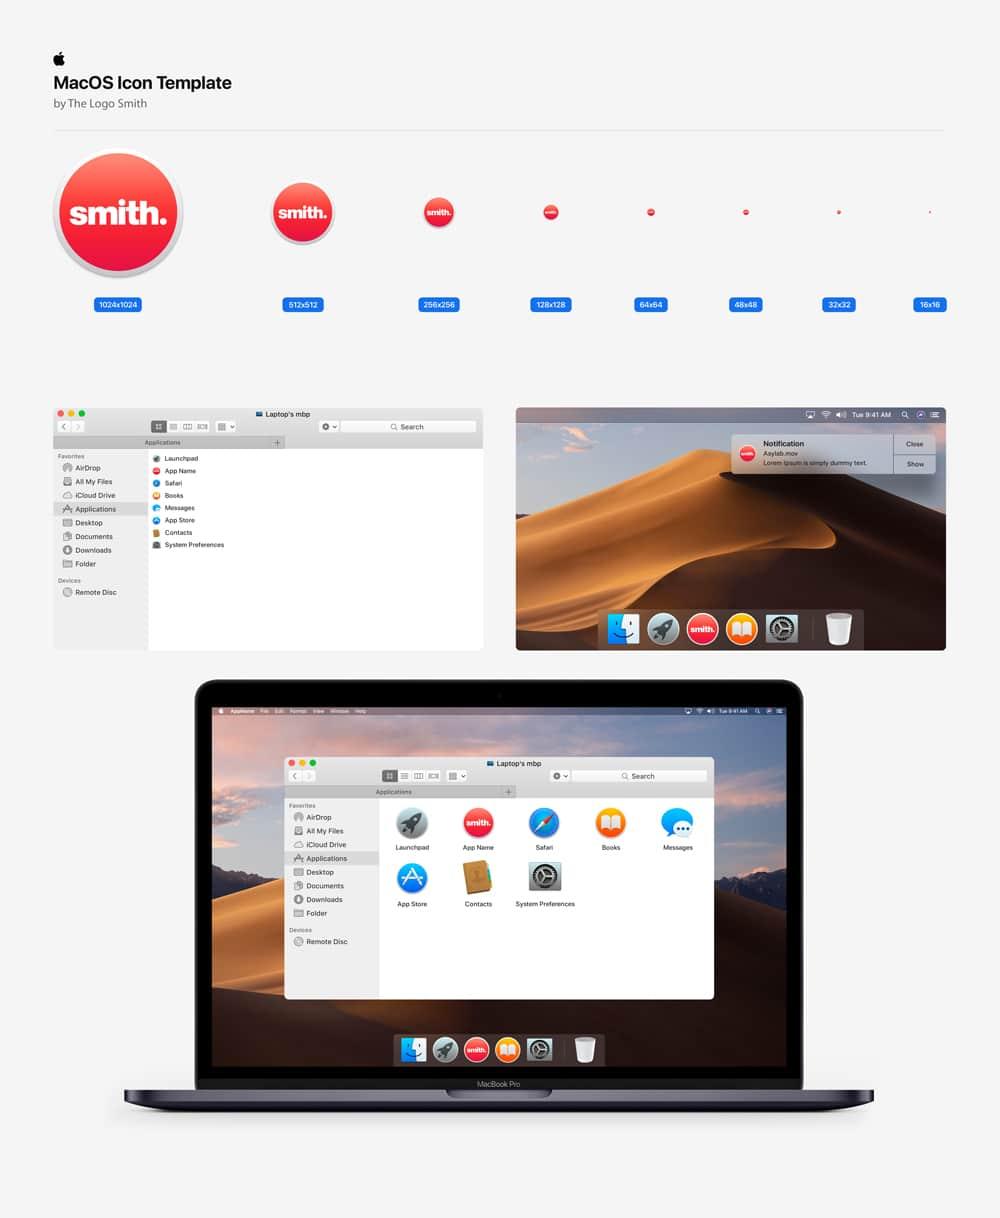 Mac OS Icon Template Mockup The Logo Smith Freelance Brand Designer